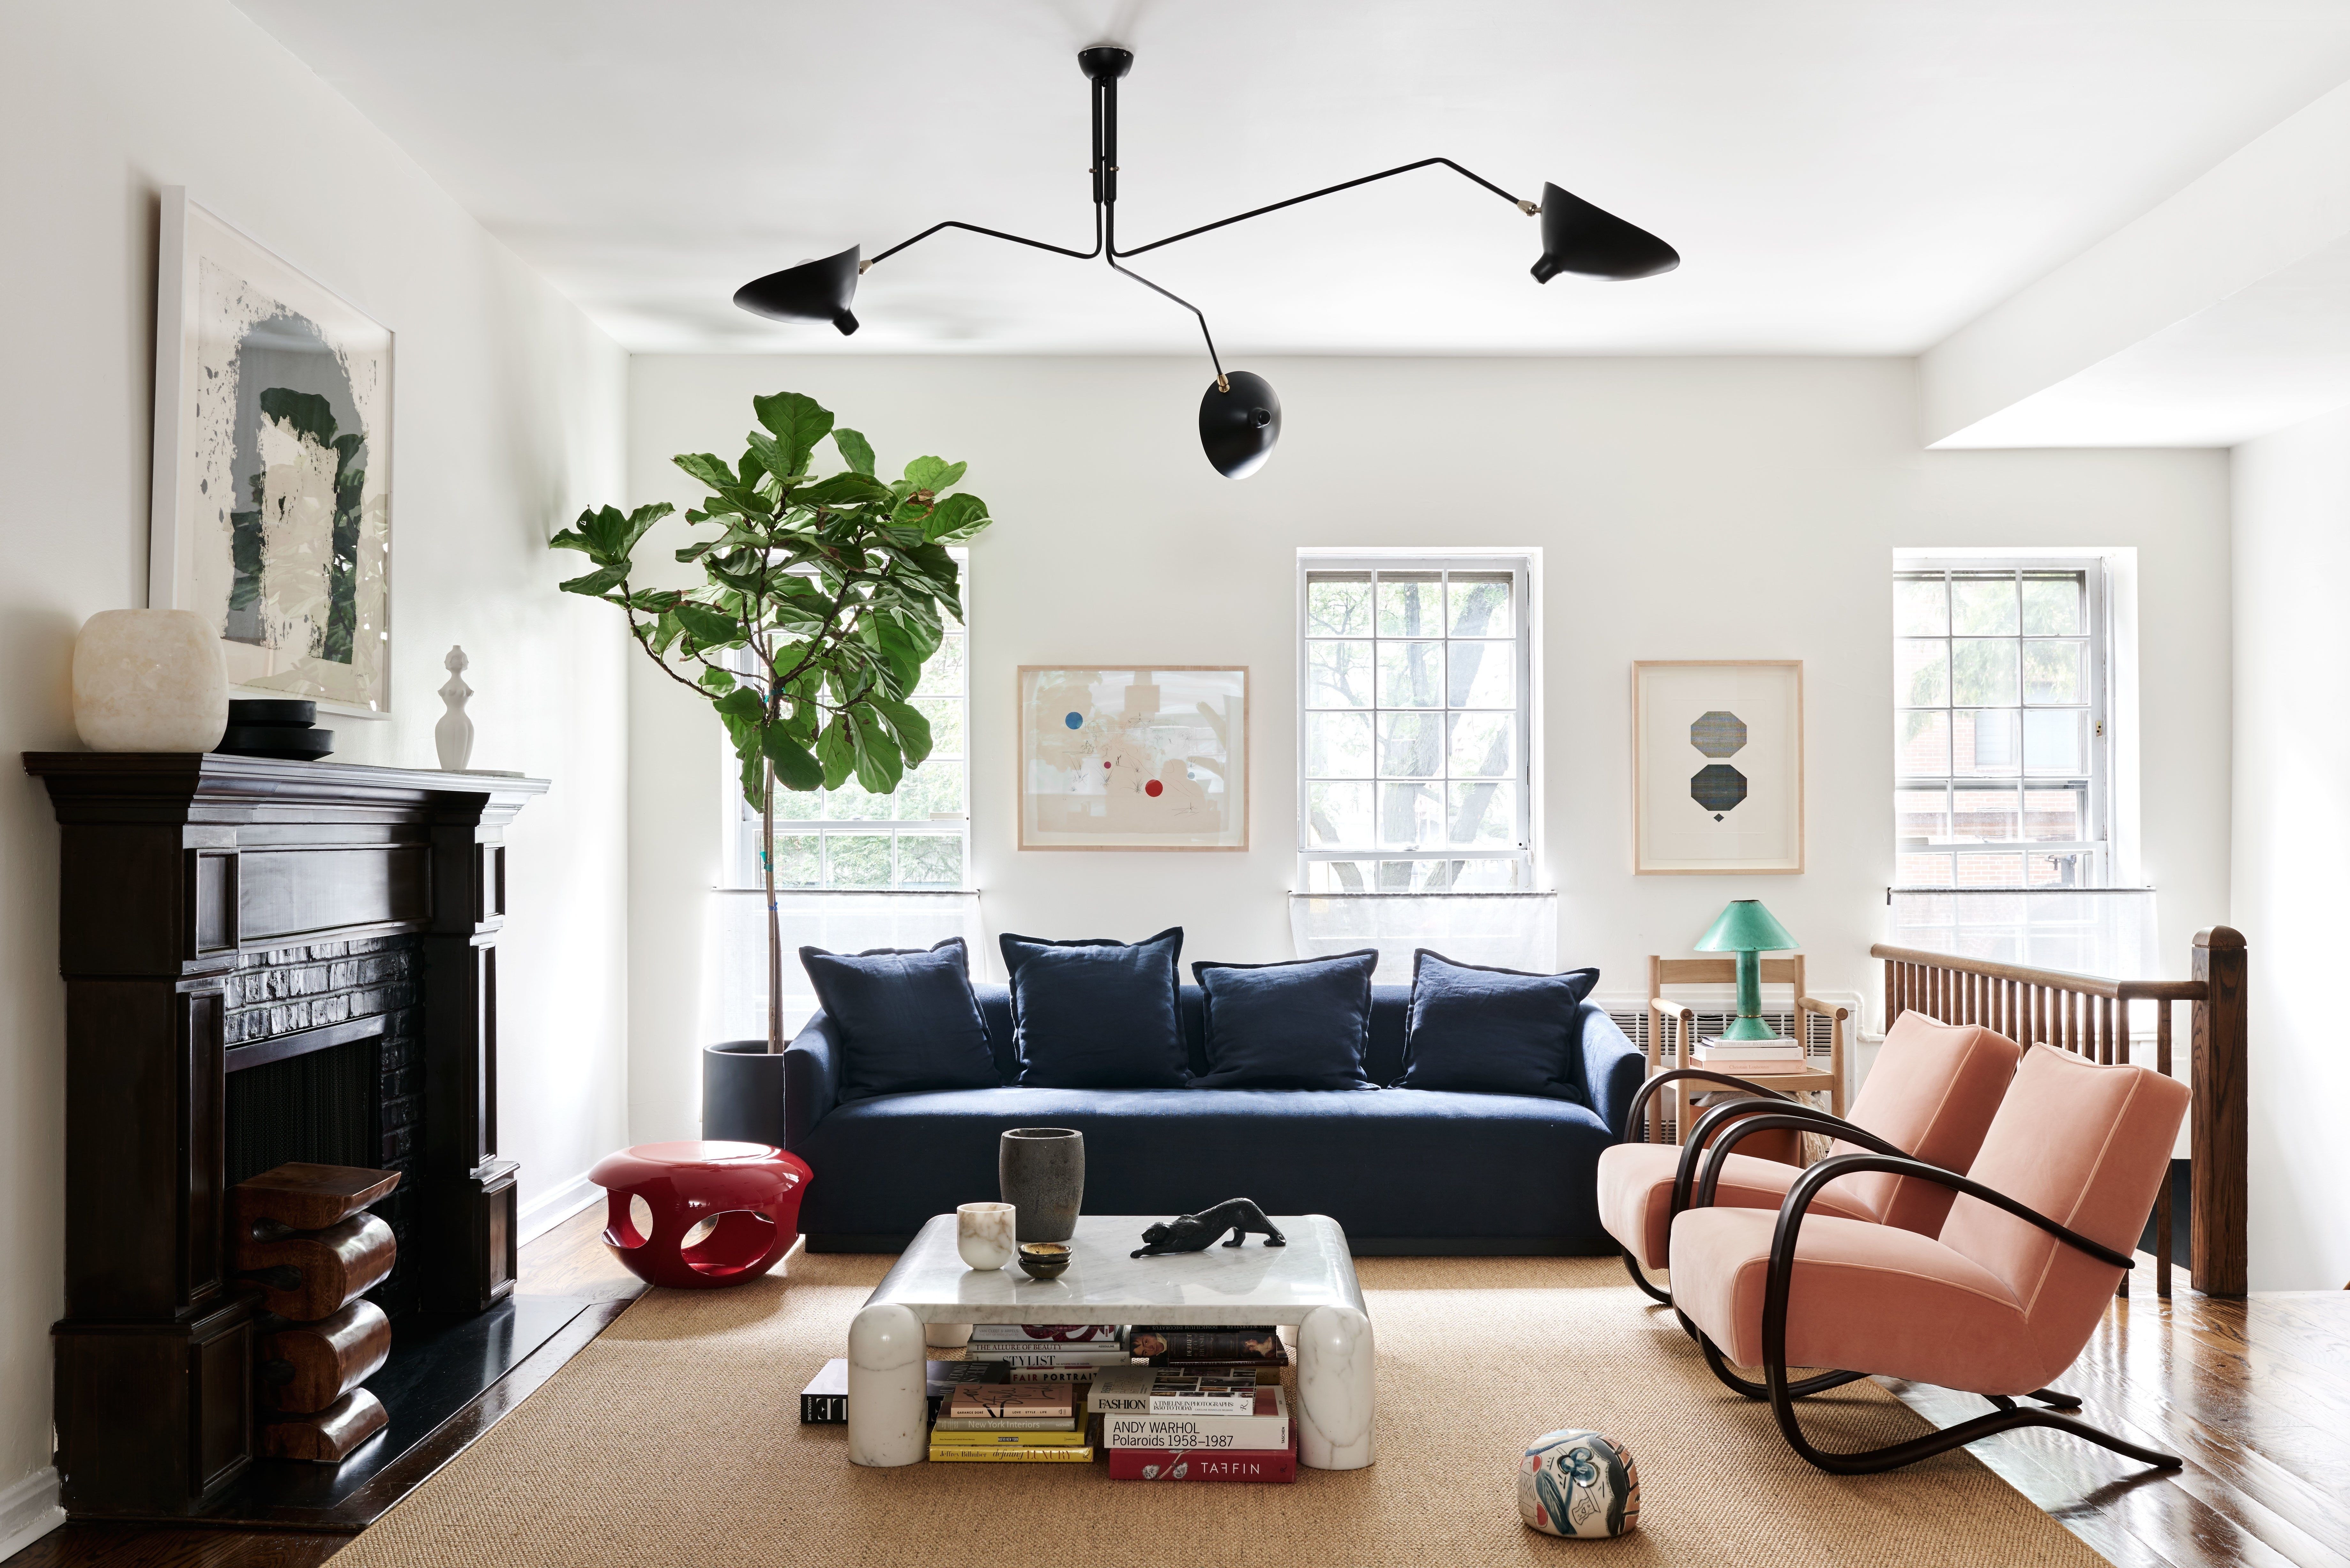 9 Best Living Room Lighting Ideas Architectural Digest Living Room Lighting Small Living Room Decor Living Room Designs